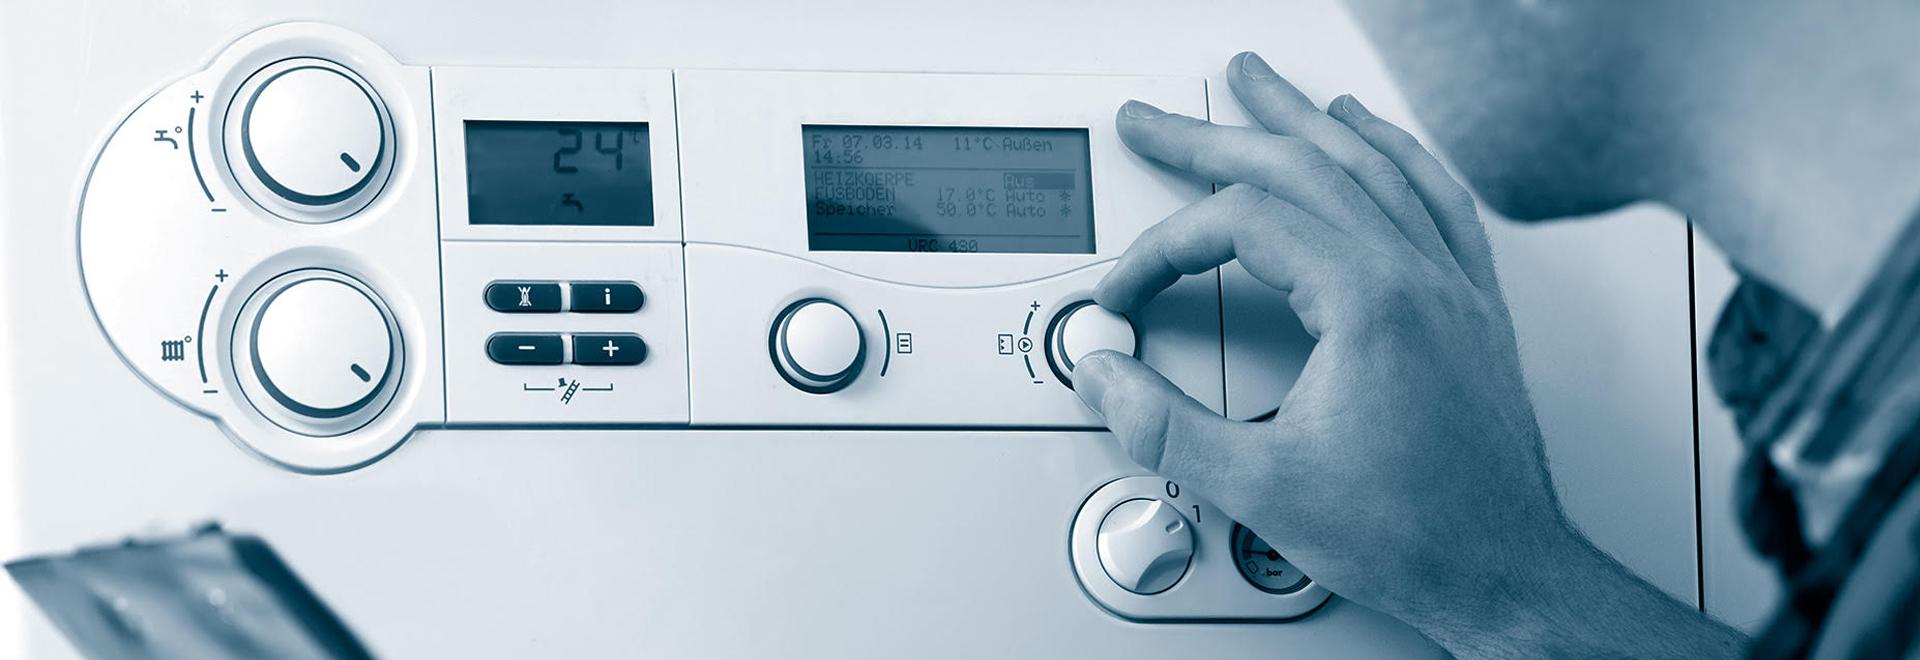 Gasfellas Plumbing & Heating Services | London | Enfield | Hertfordshire